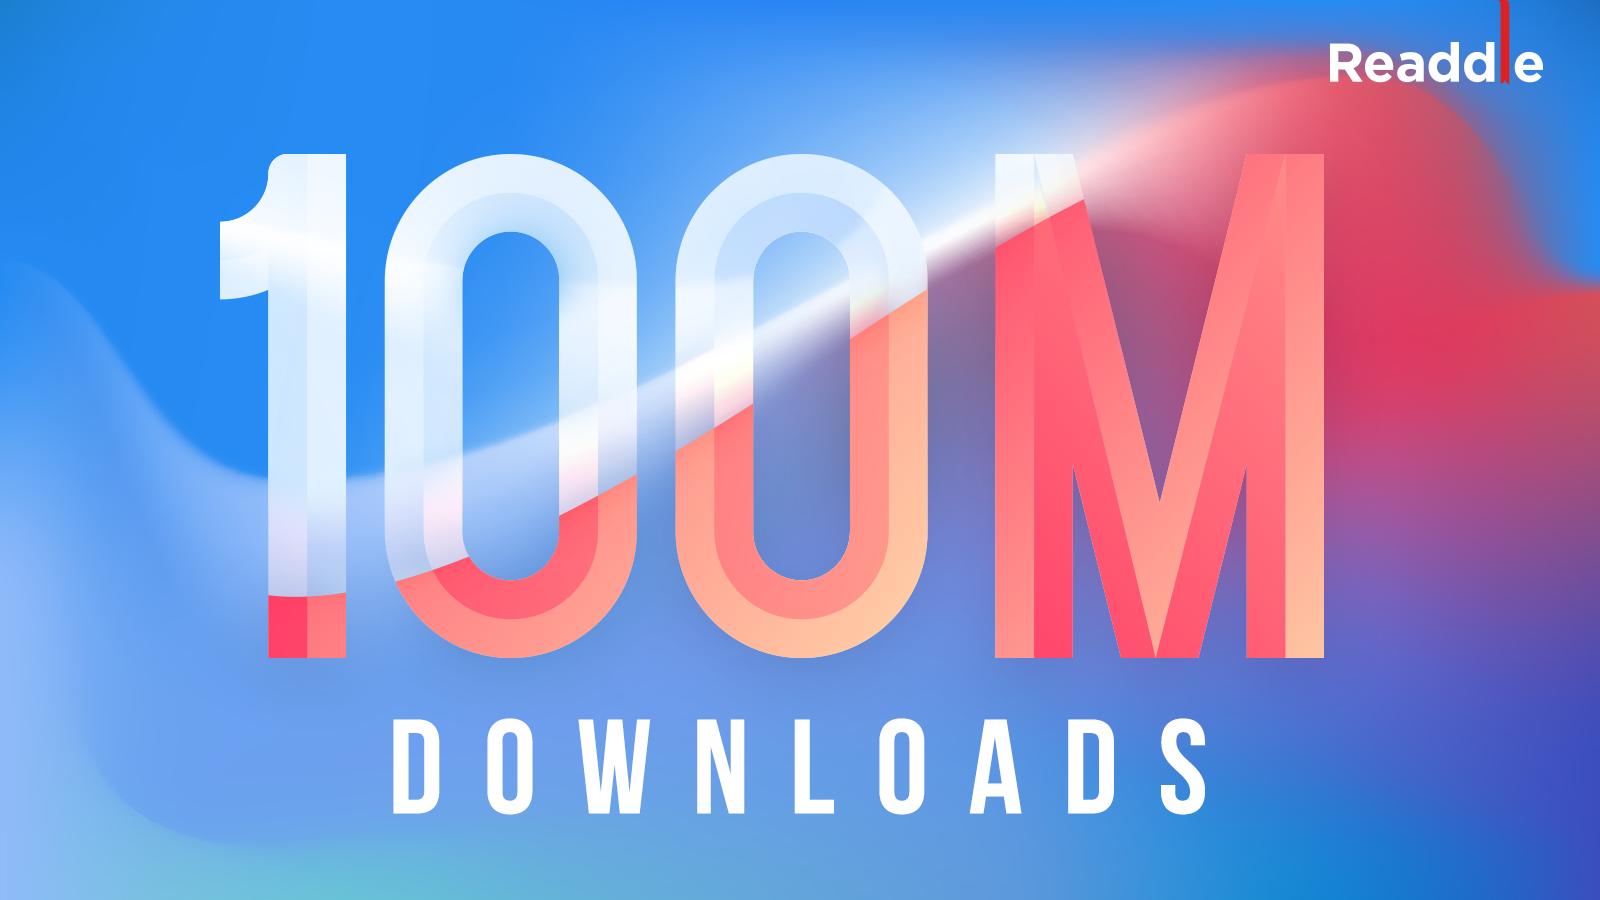 Buy 10,000 installs of my Windows app.